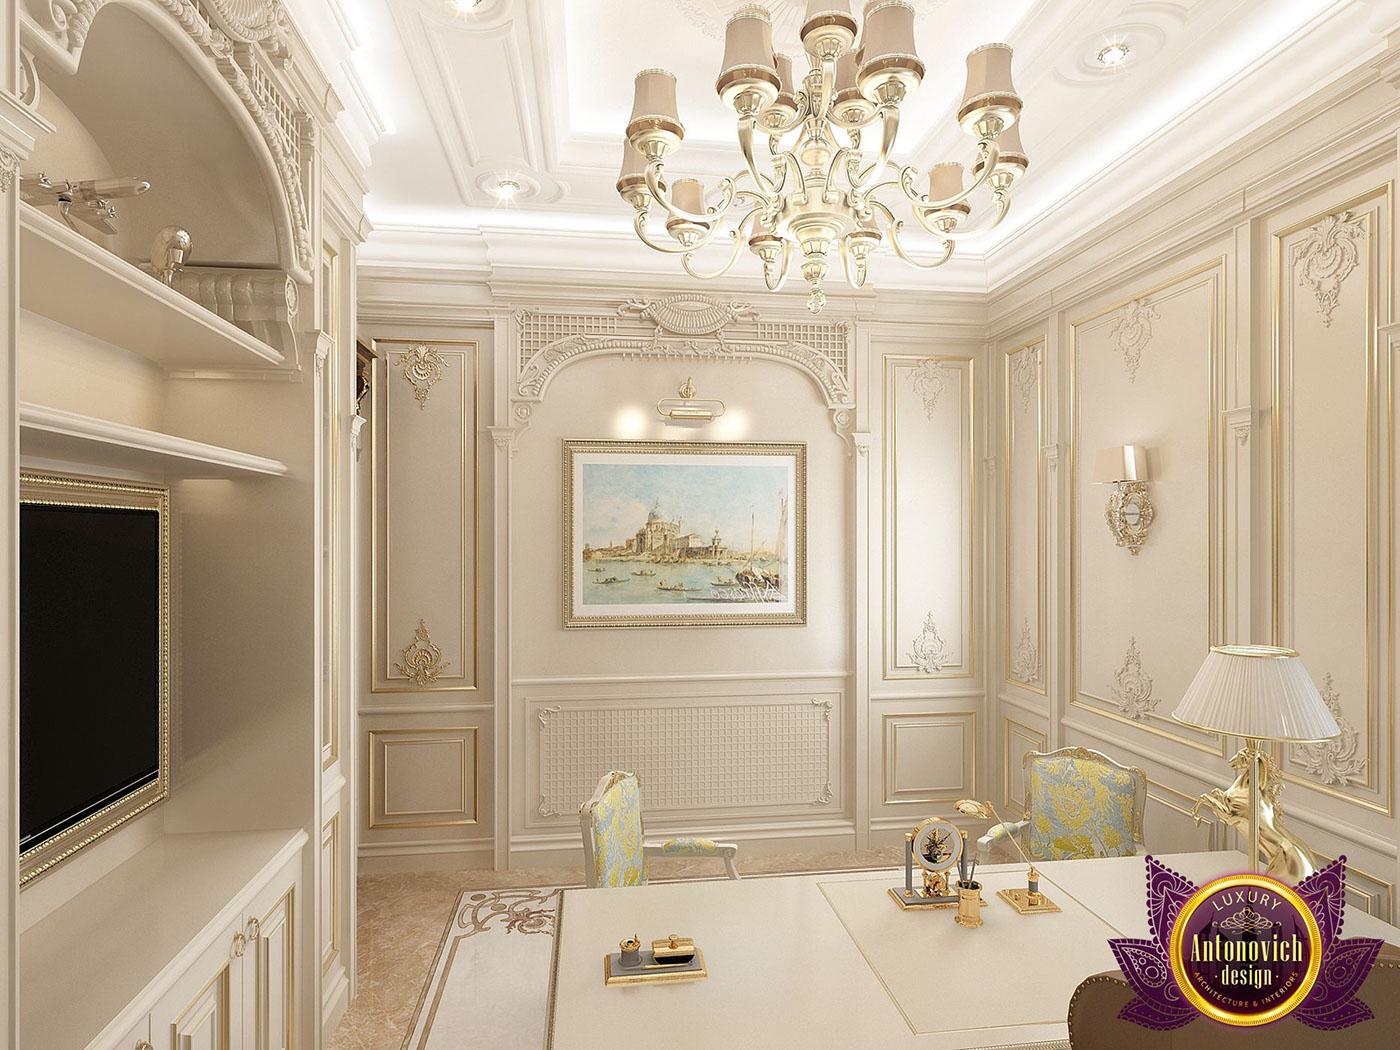 Luxury Office Interior Design By Katrina Antonovich On Behance